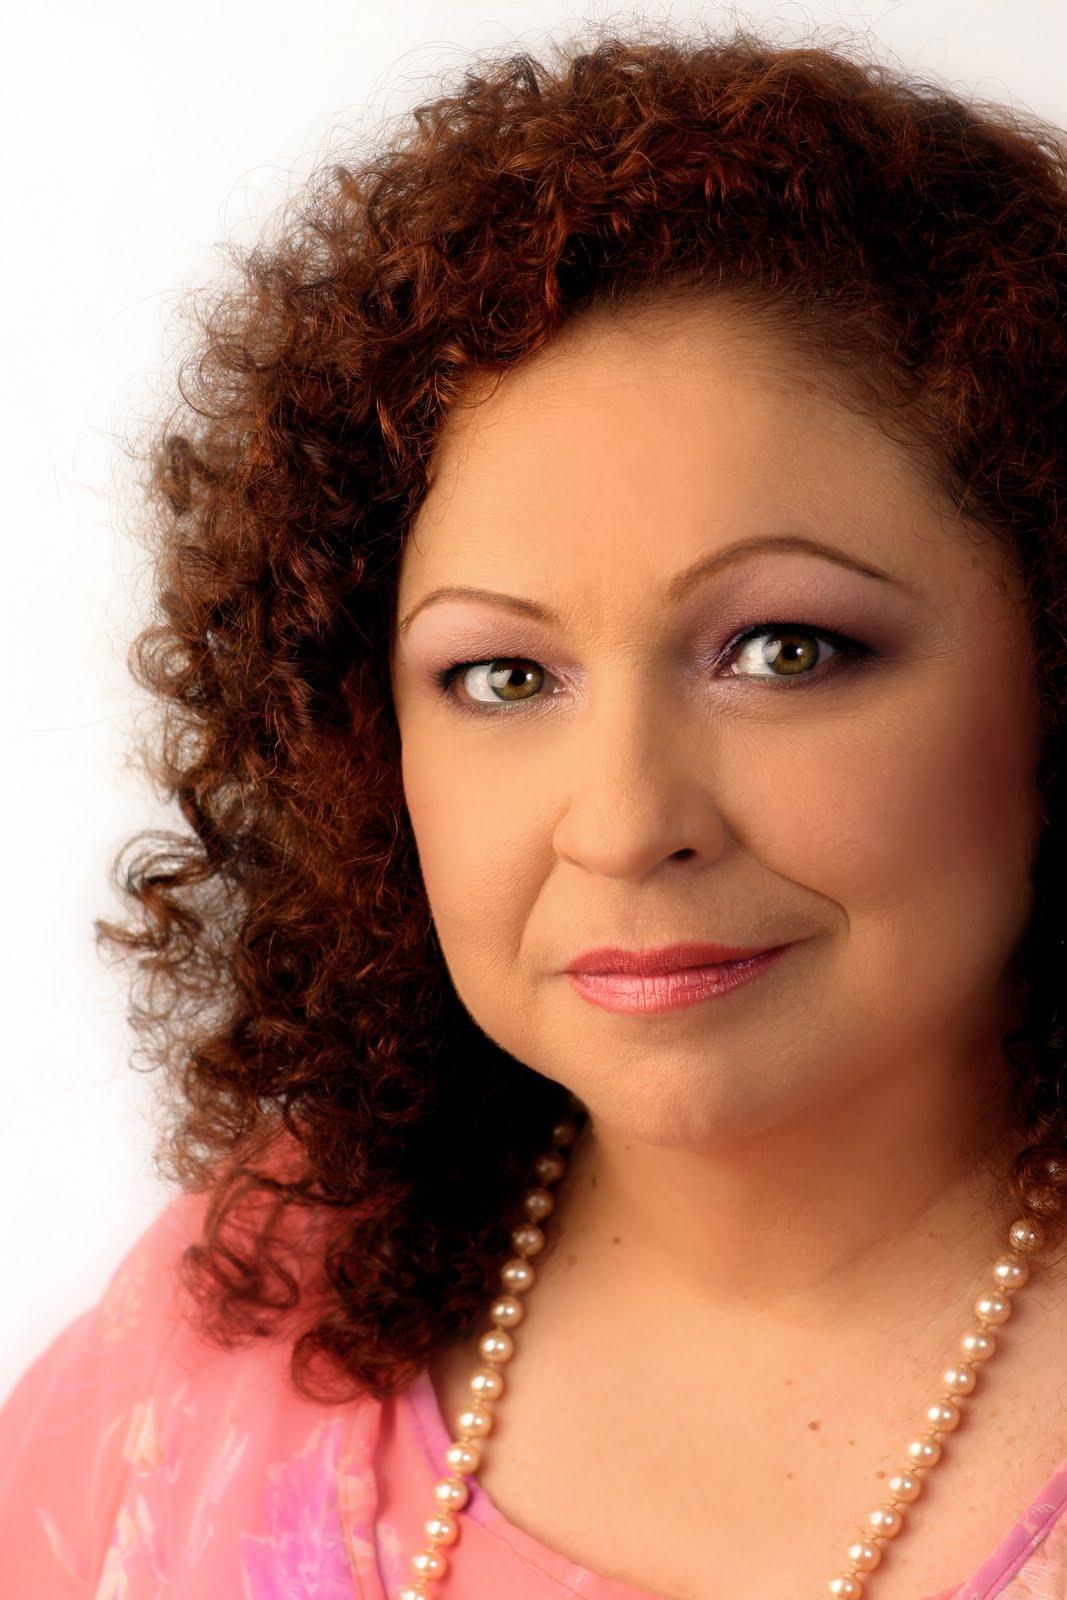 Artista Sonia Silvestre padece de insuficiencia renal aguda